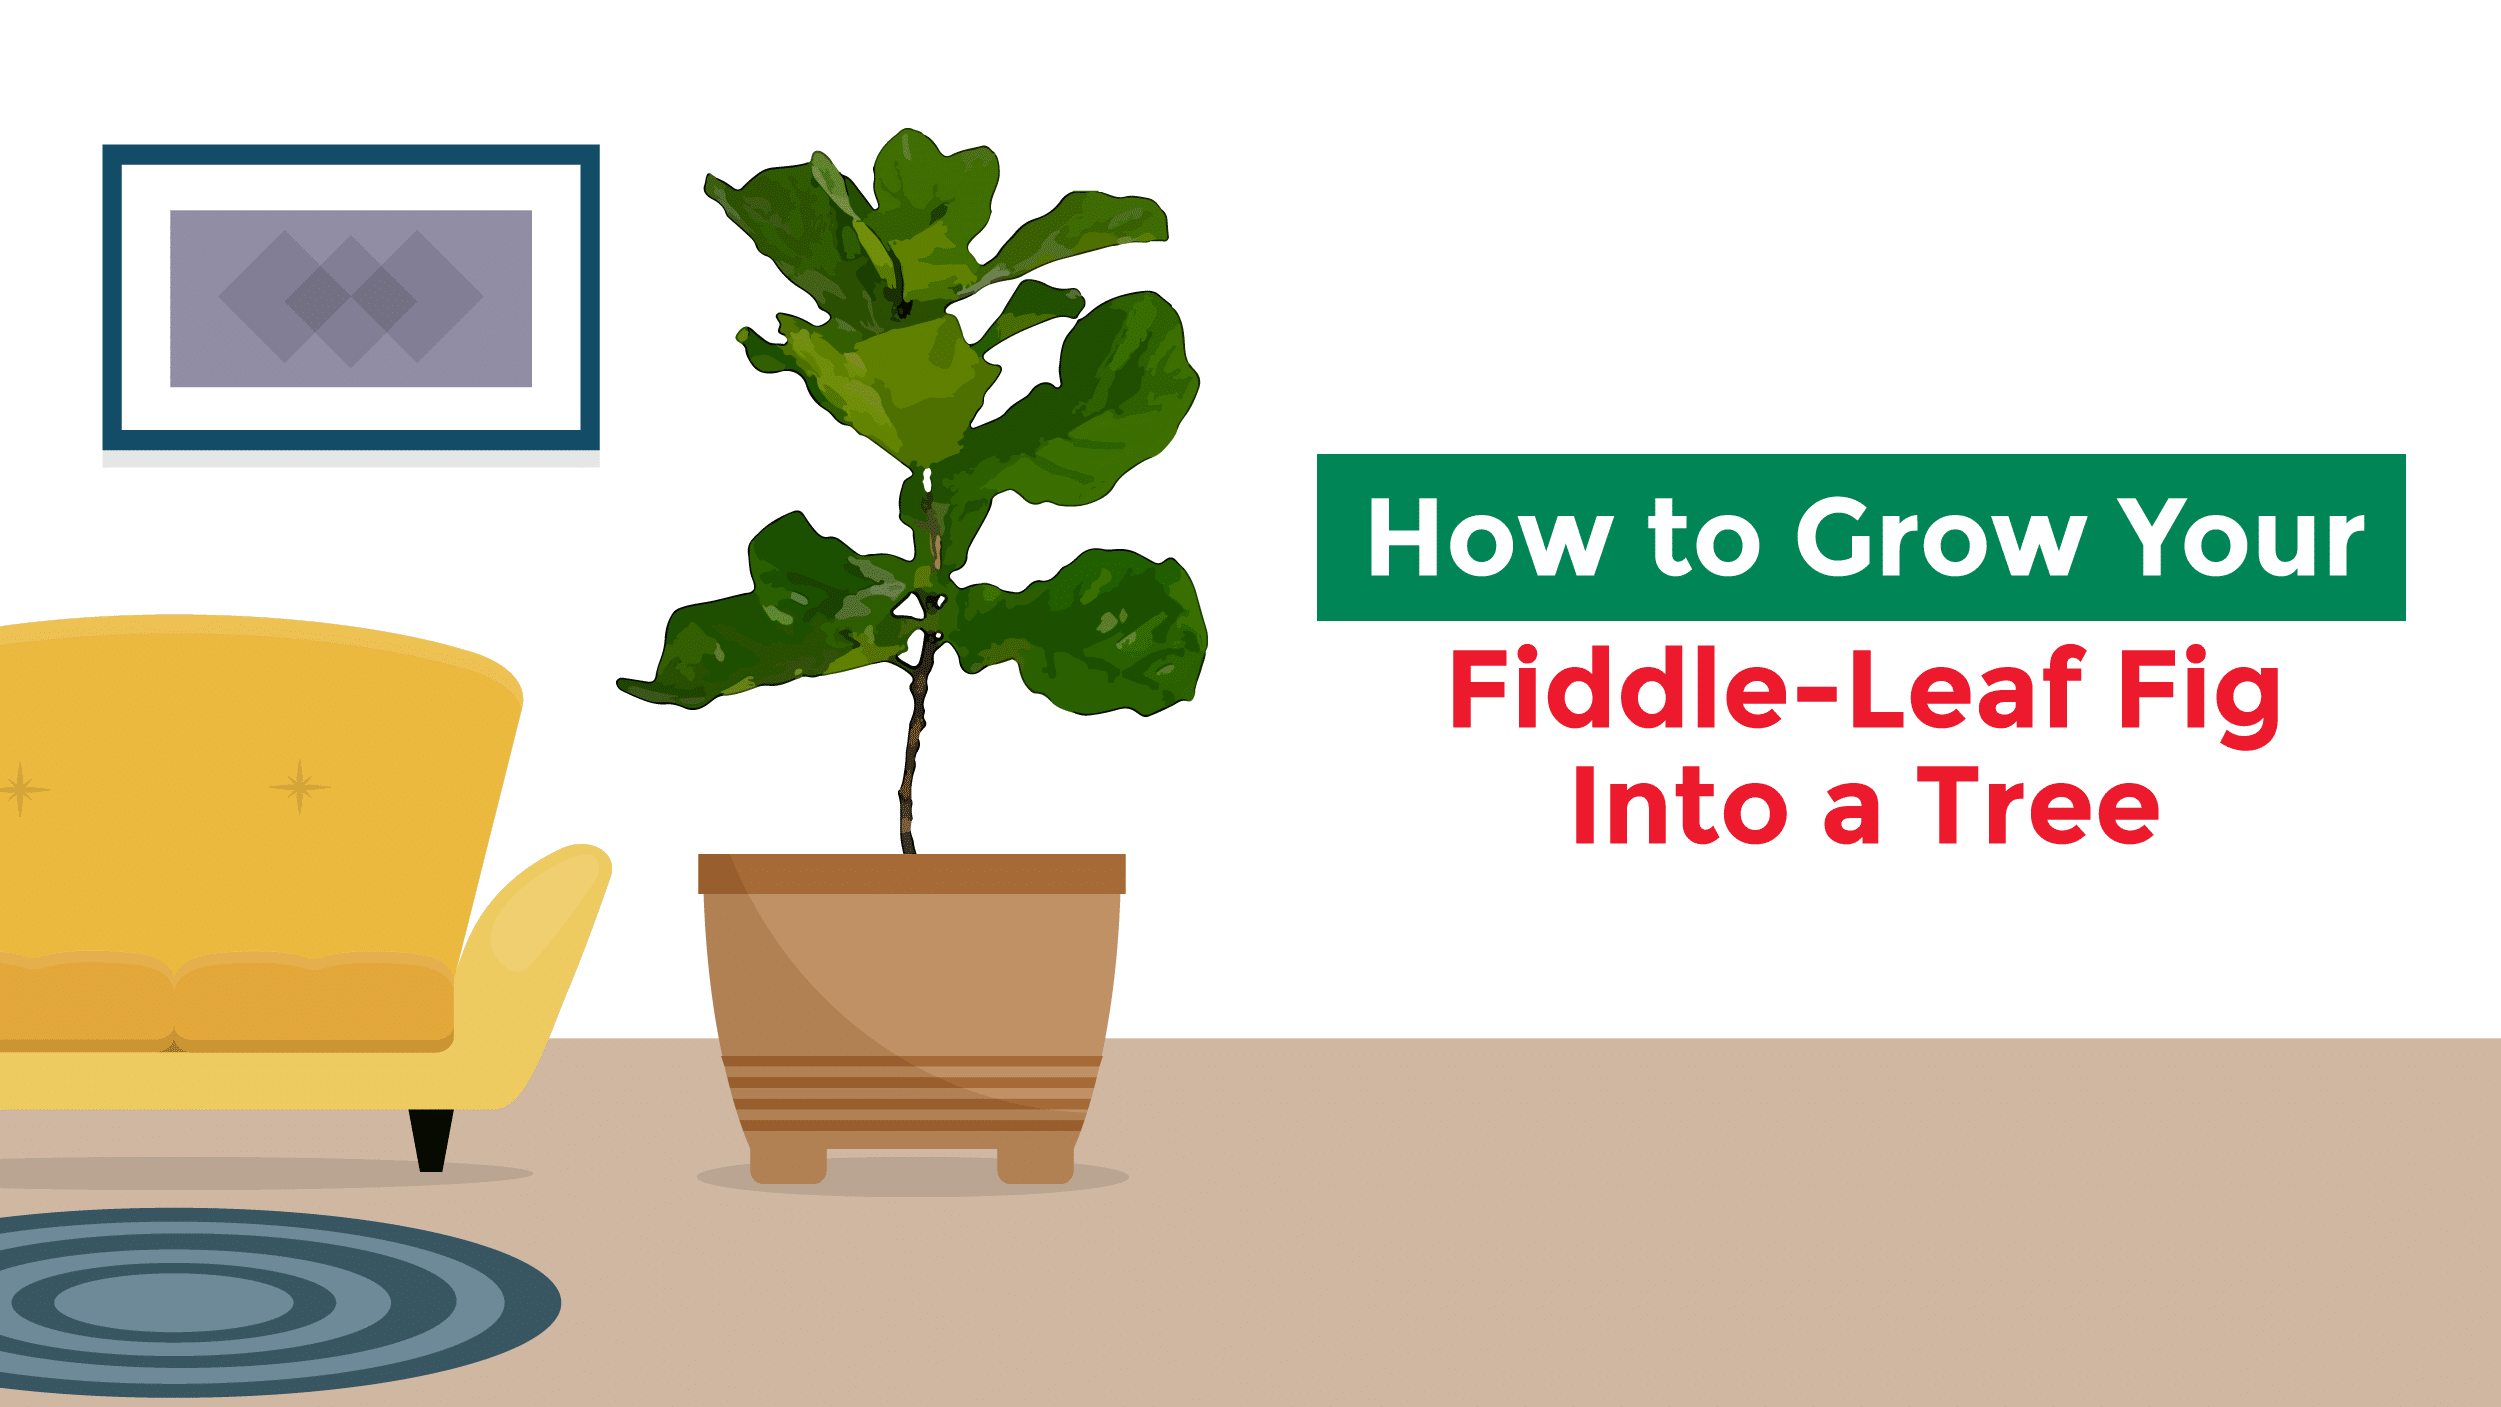 Illustration of a fiddle-leaf fig tree in a modern room.